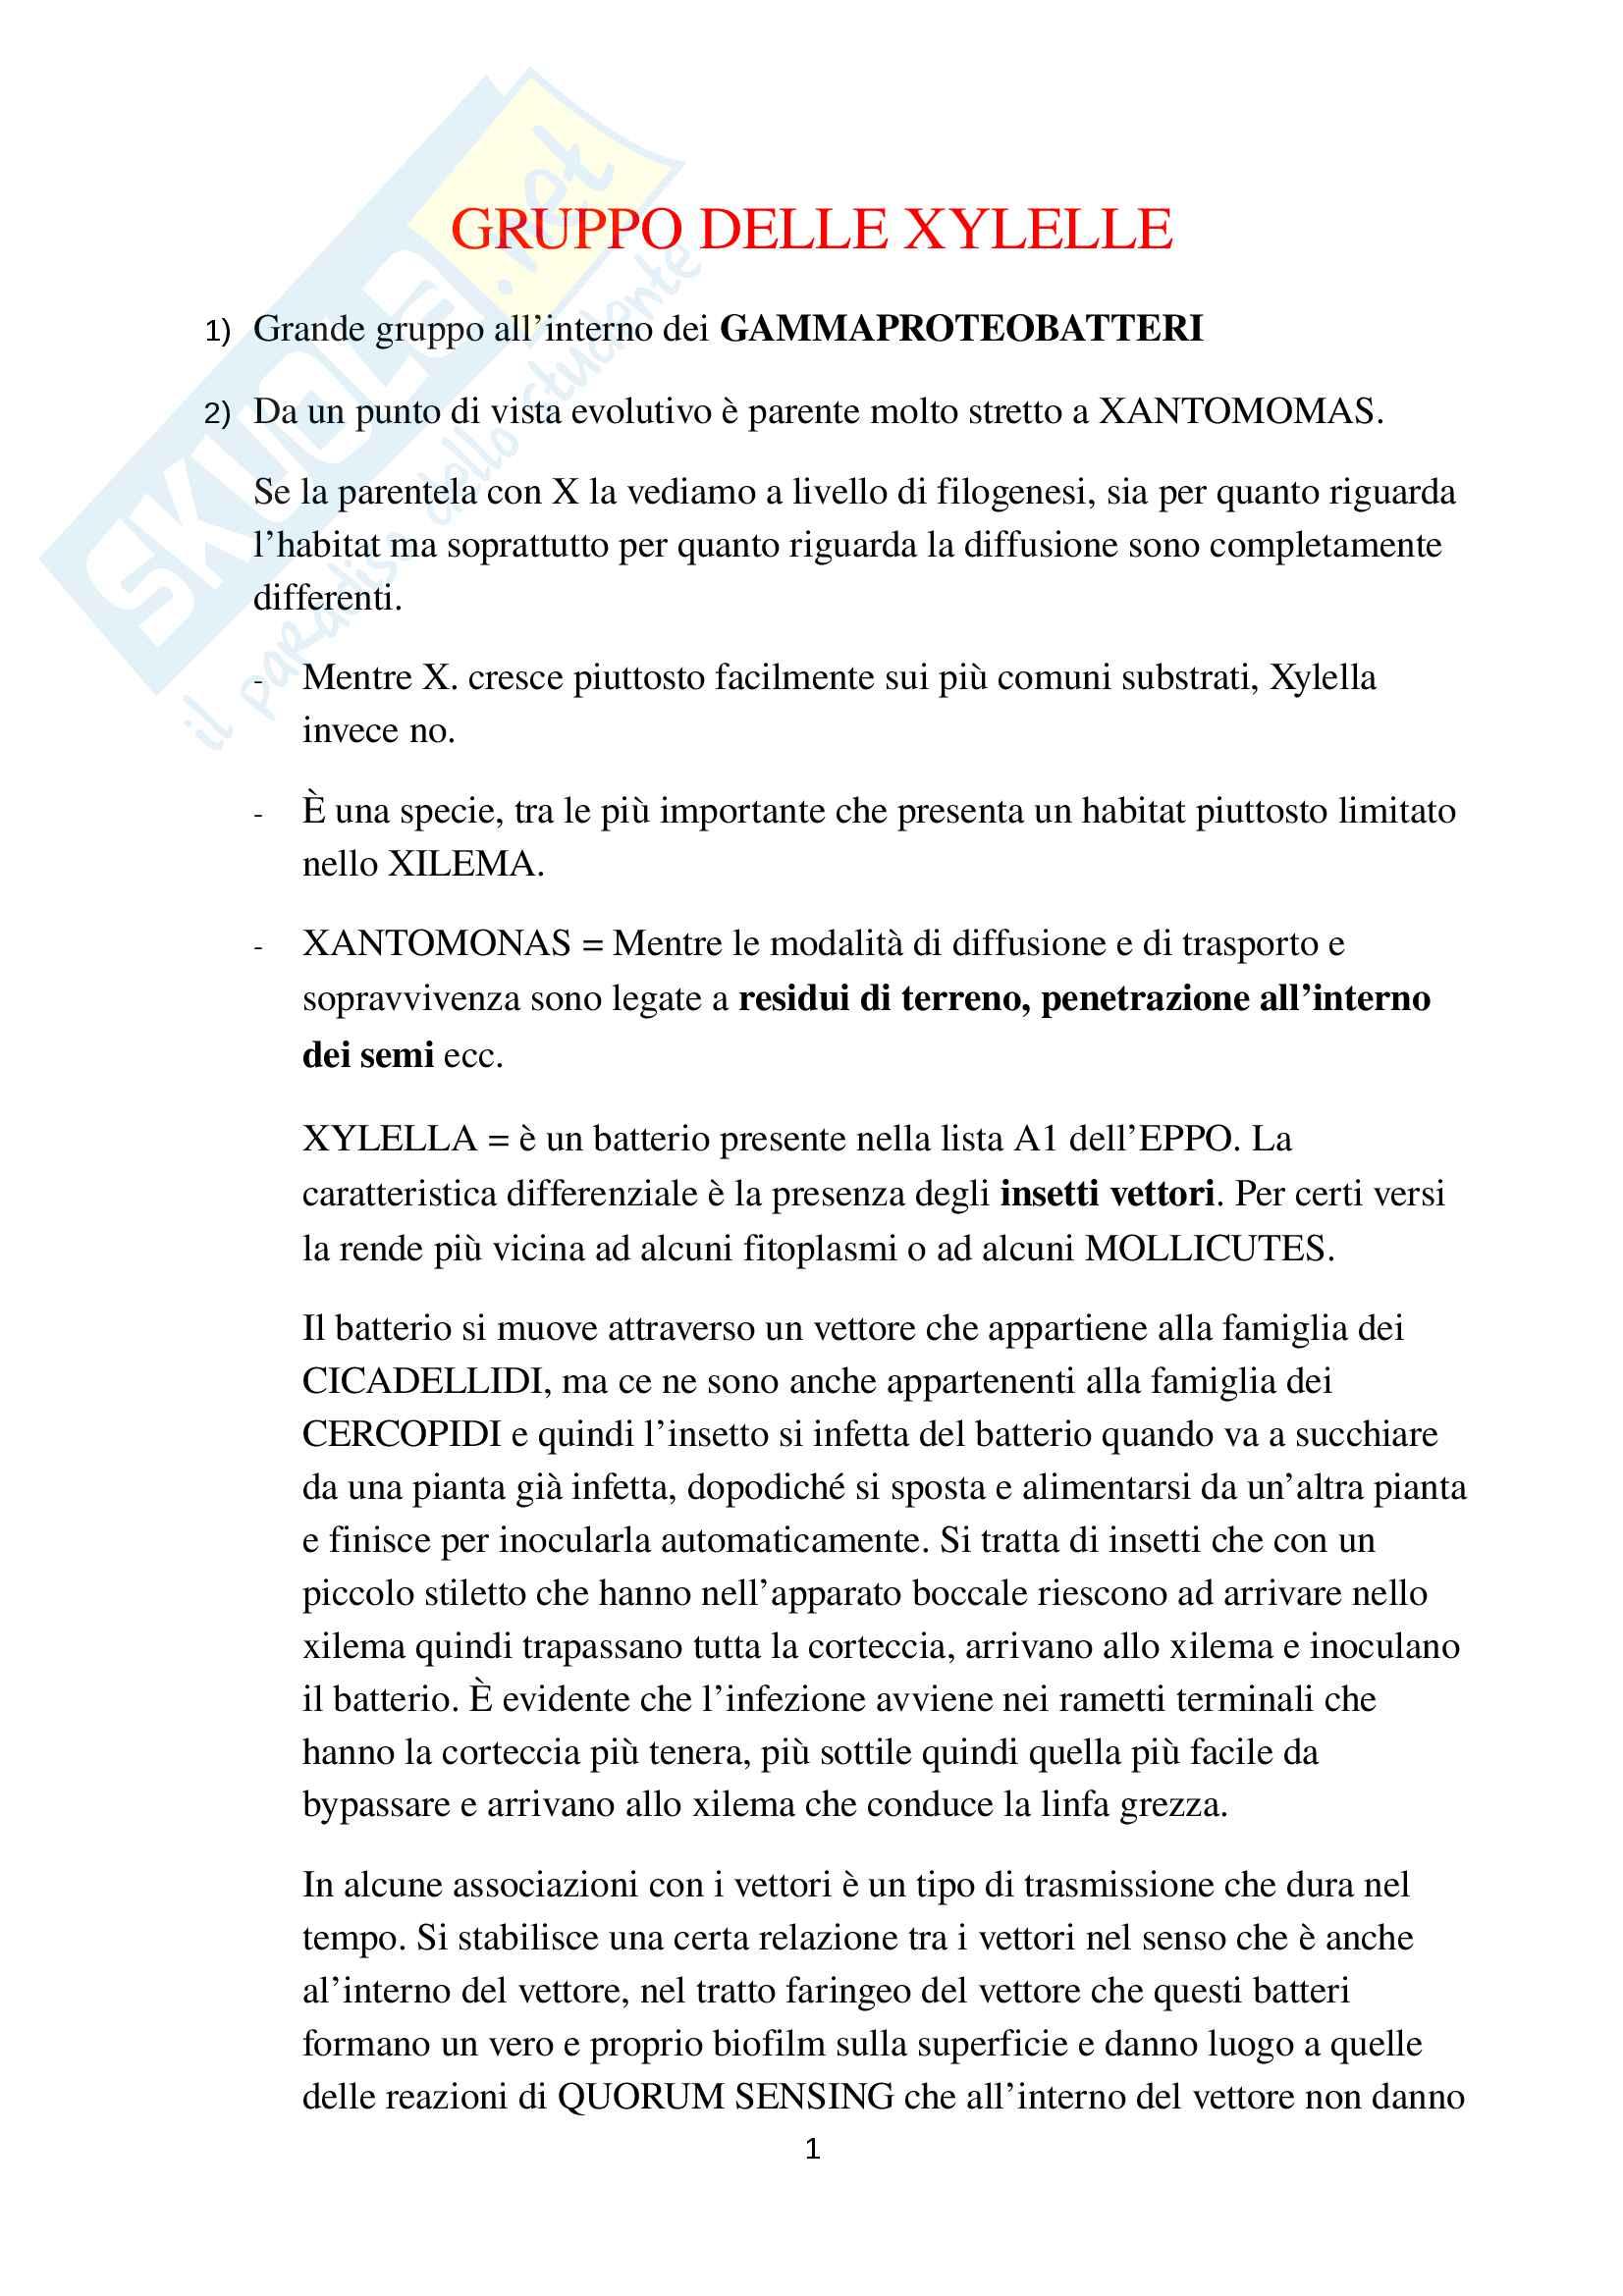 Parte speciale Batteriologia Xylella Pseudomonas e Xanthomonas